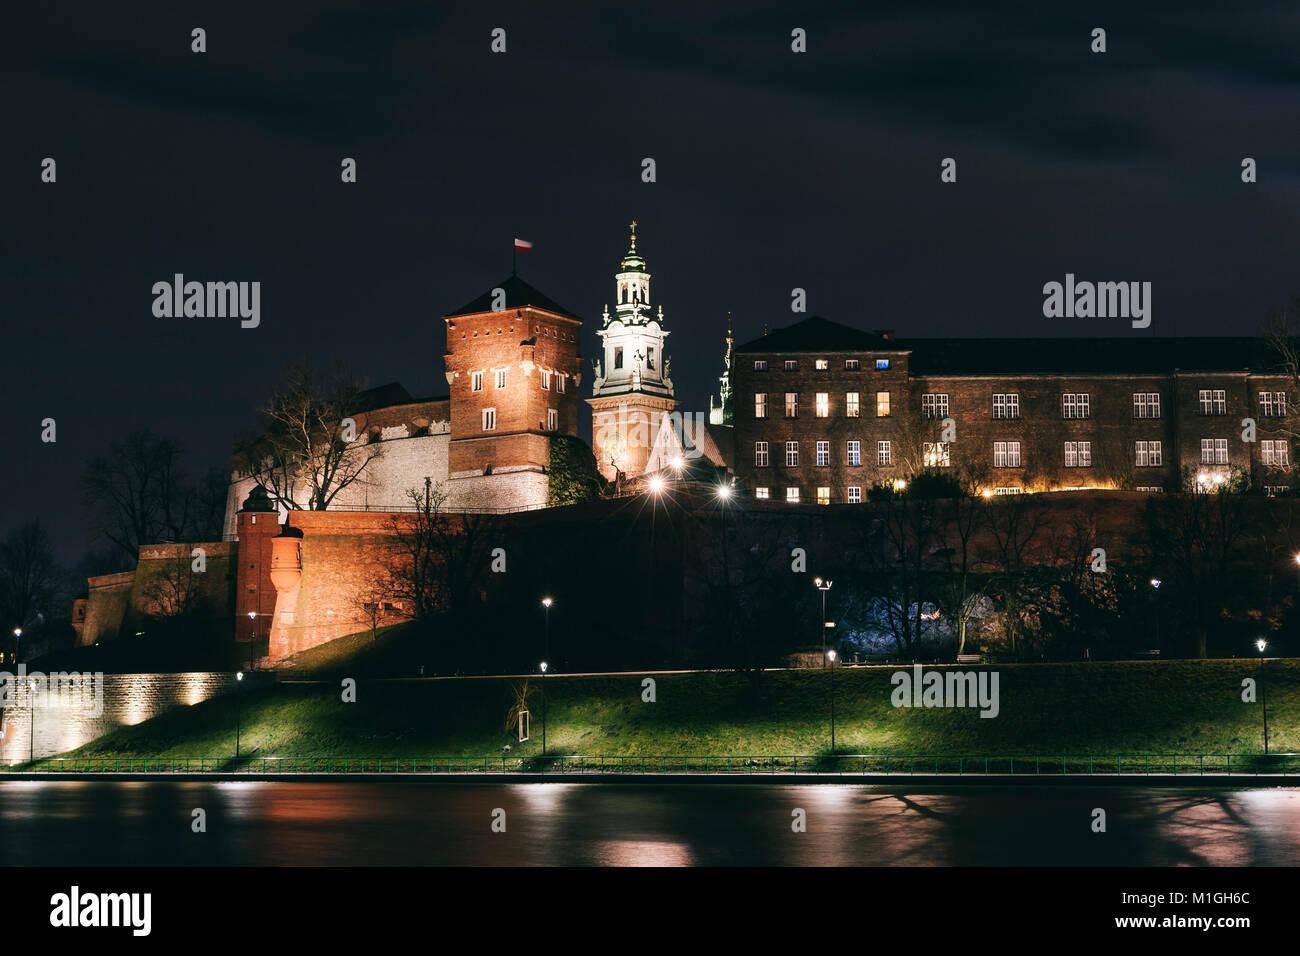 Wawel Castle in Krakow, Poland at night - Stock Image